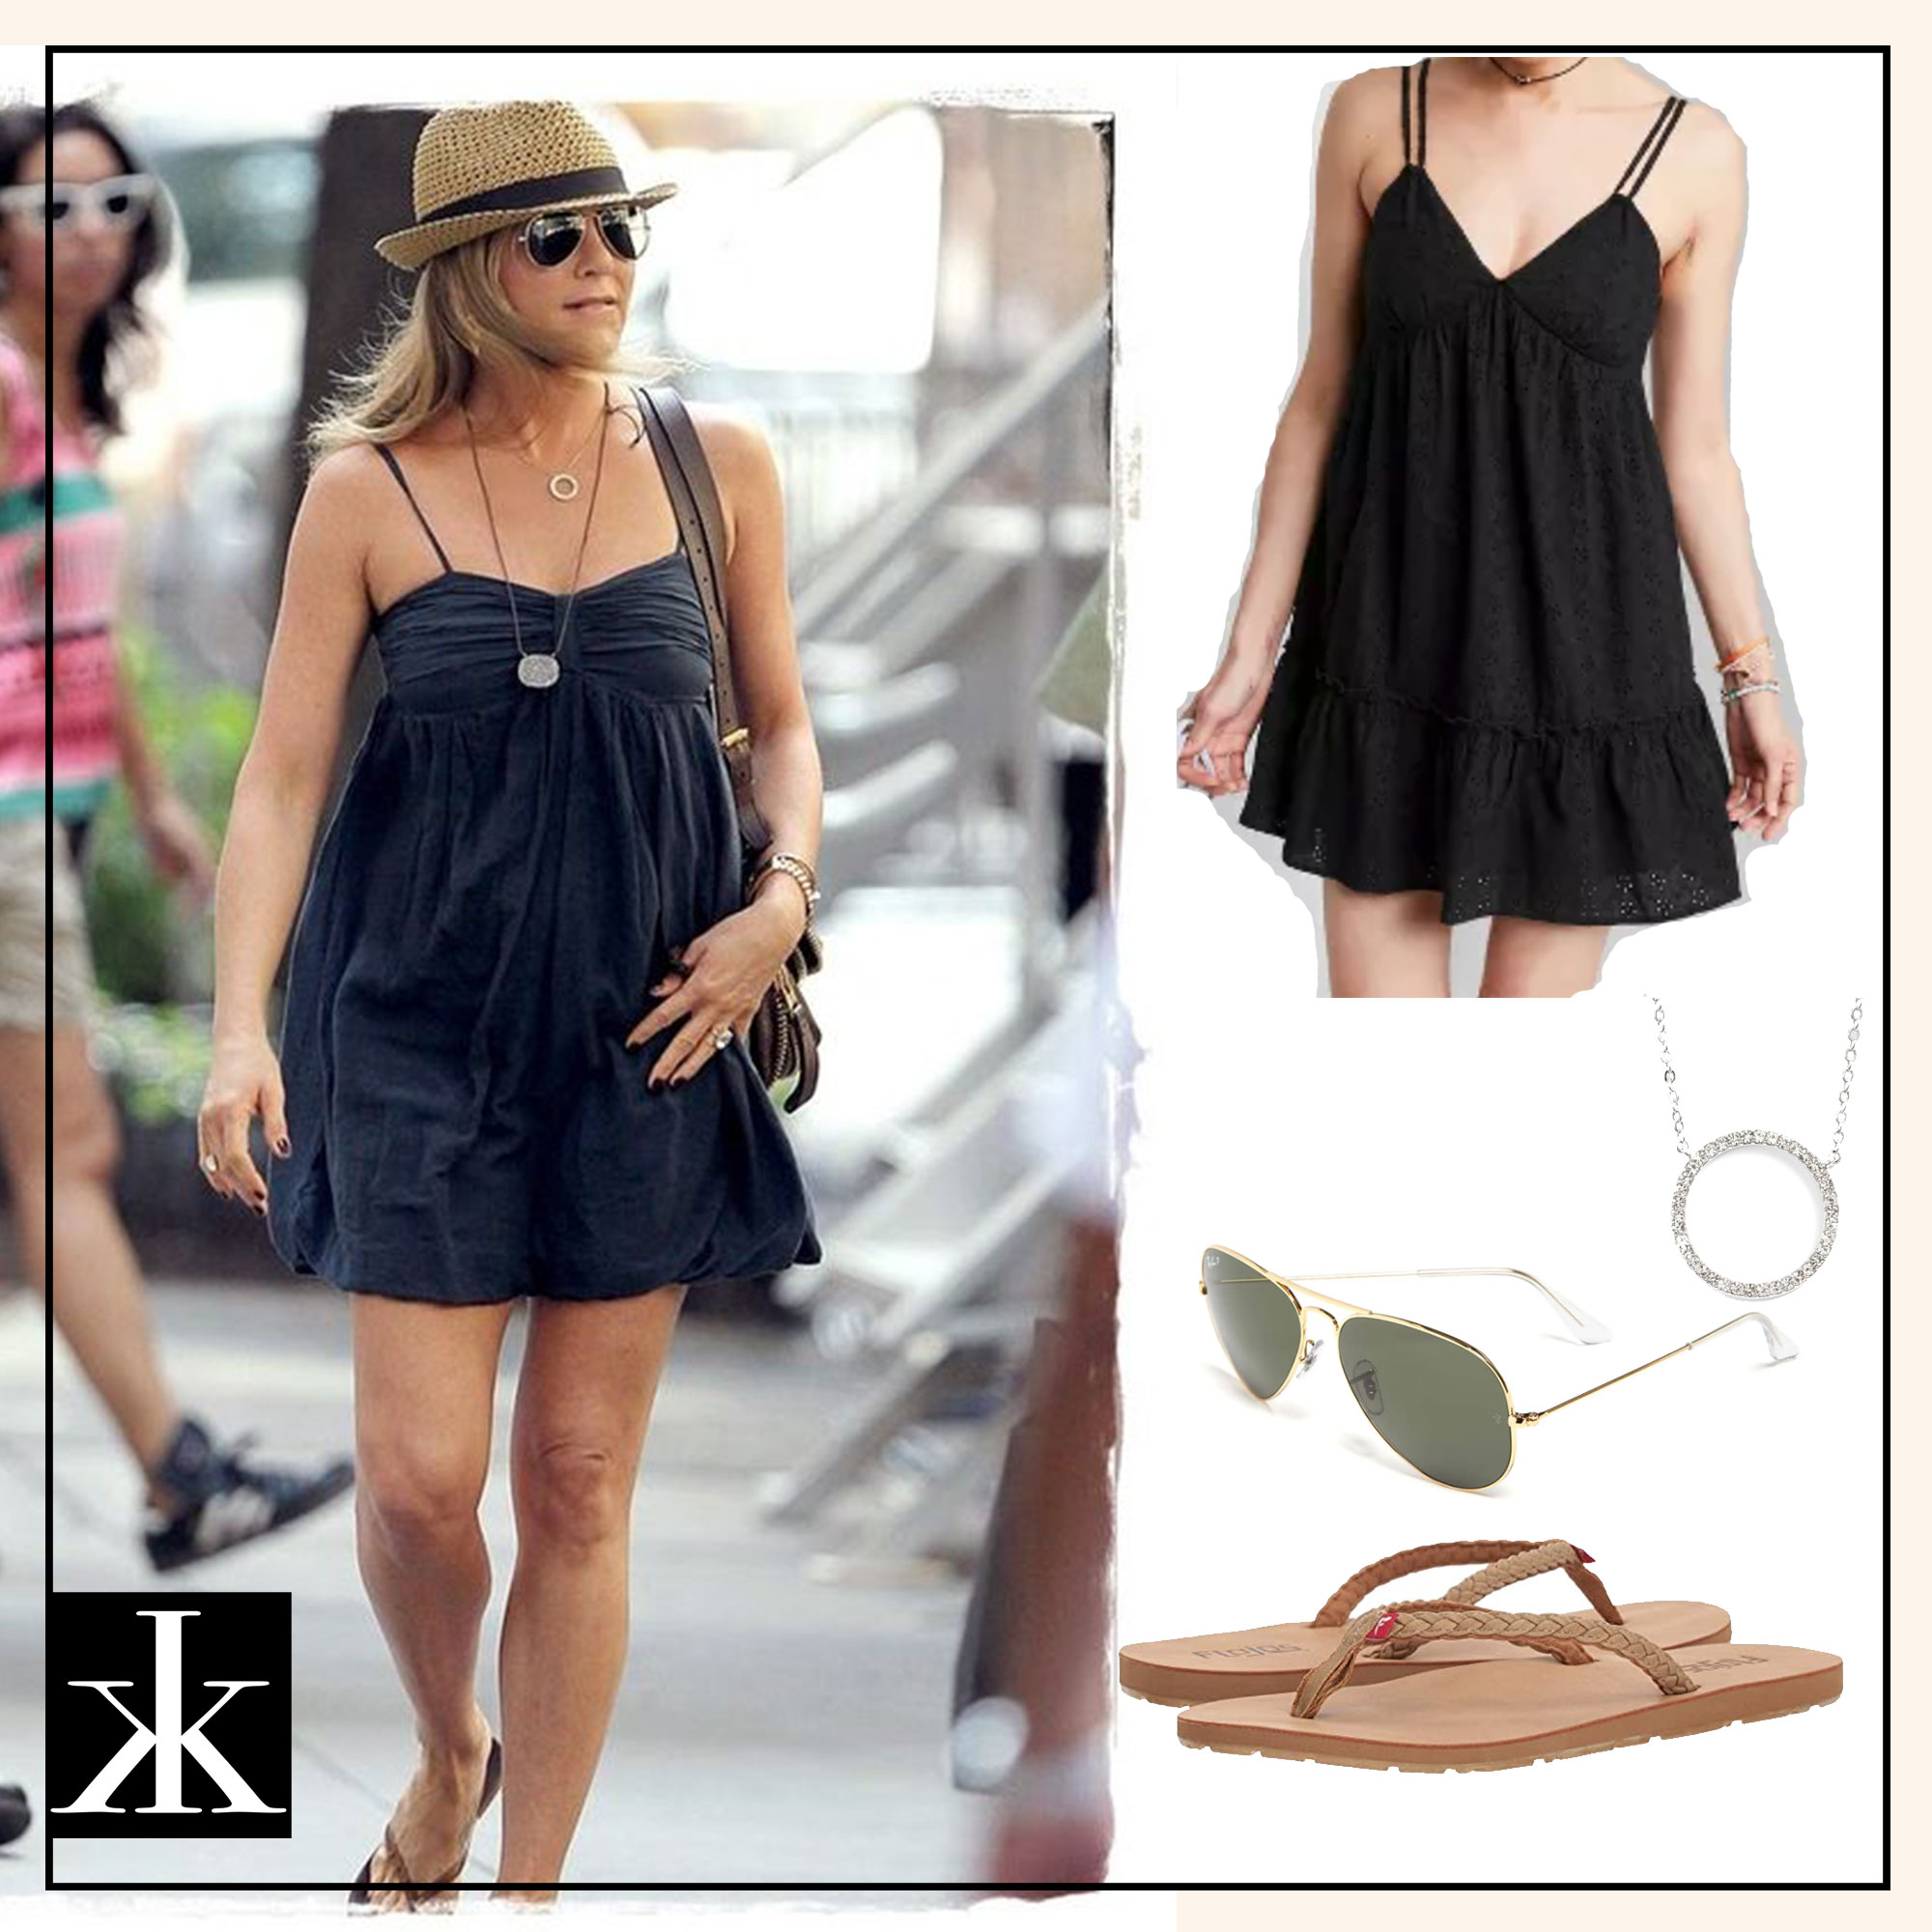 Jennifer Aniston Summer Out Inspiration 4